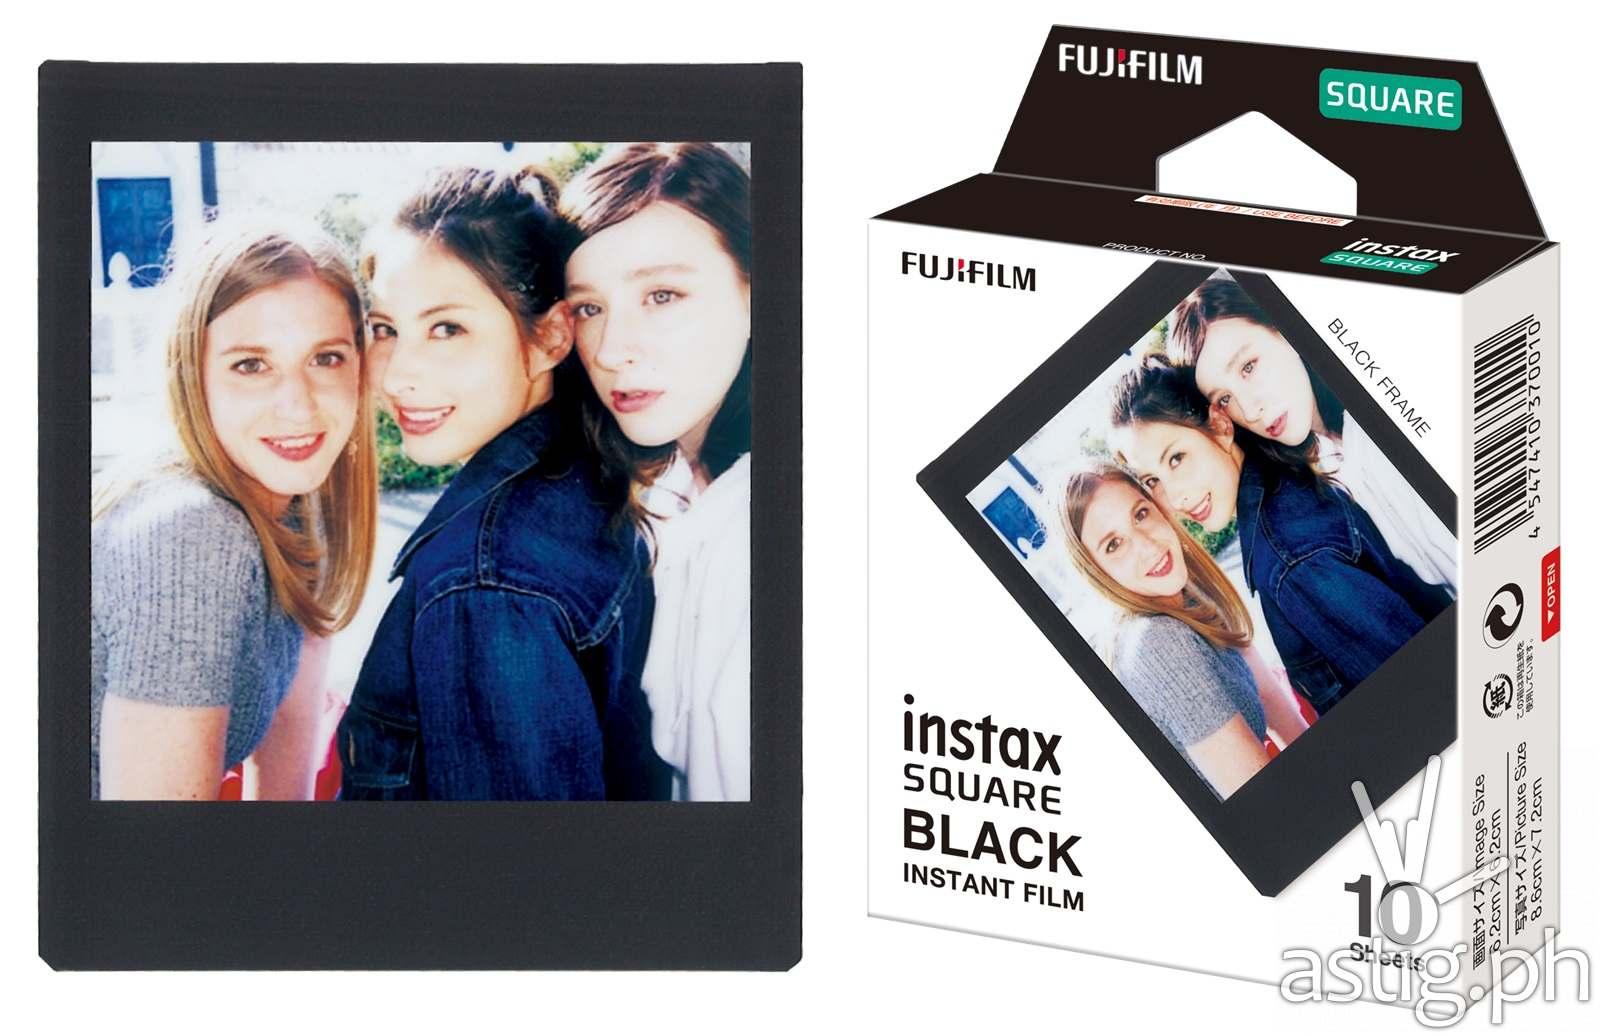 instax square black frame